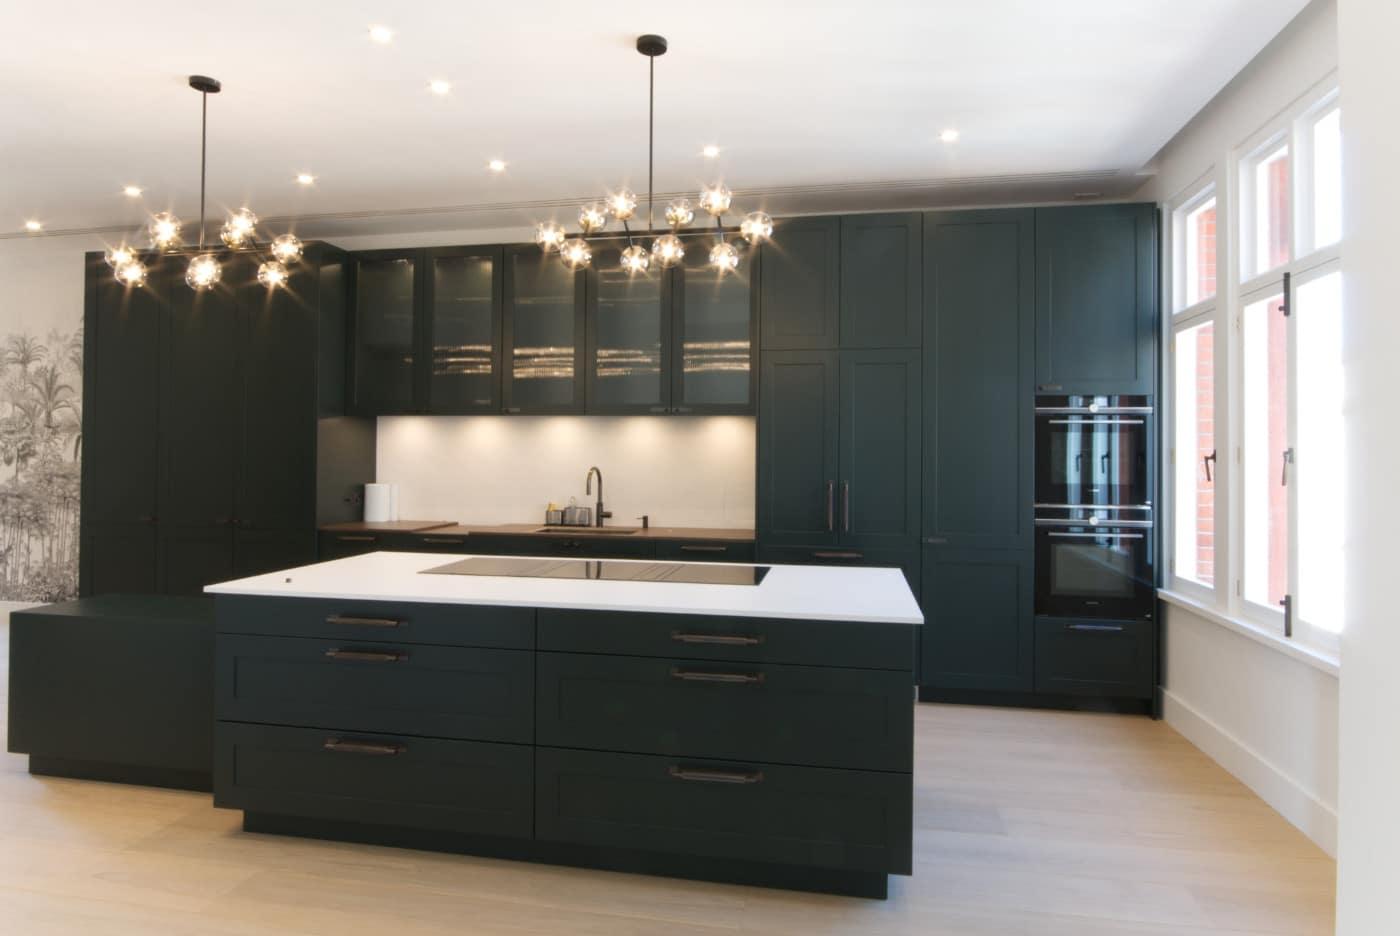 bespoke green kitchen